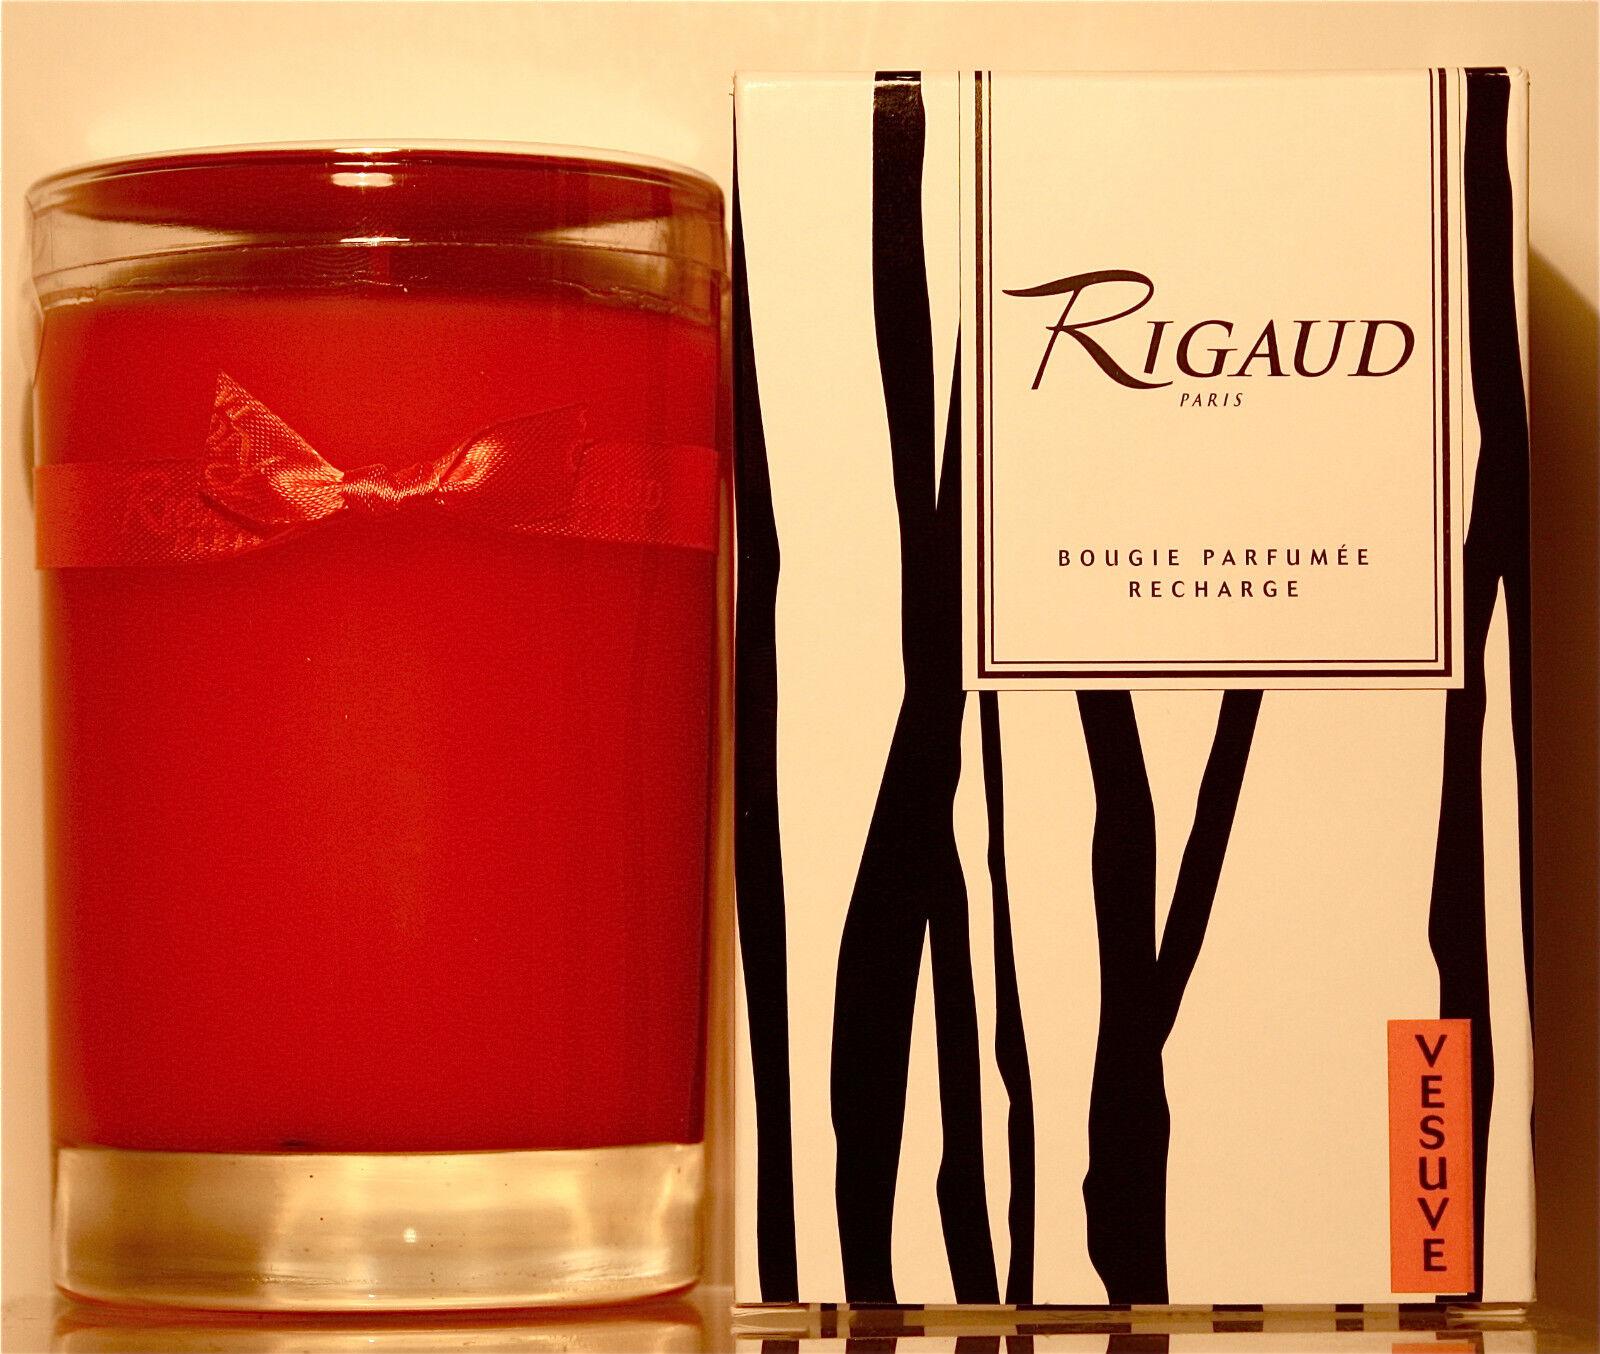 Rigaud Vesuve Large Größe Candle Refill (7.4 oz.) (65 hour)